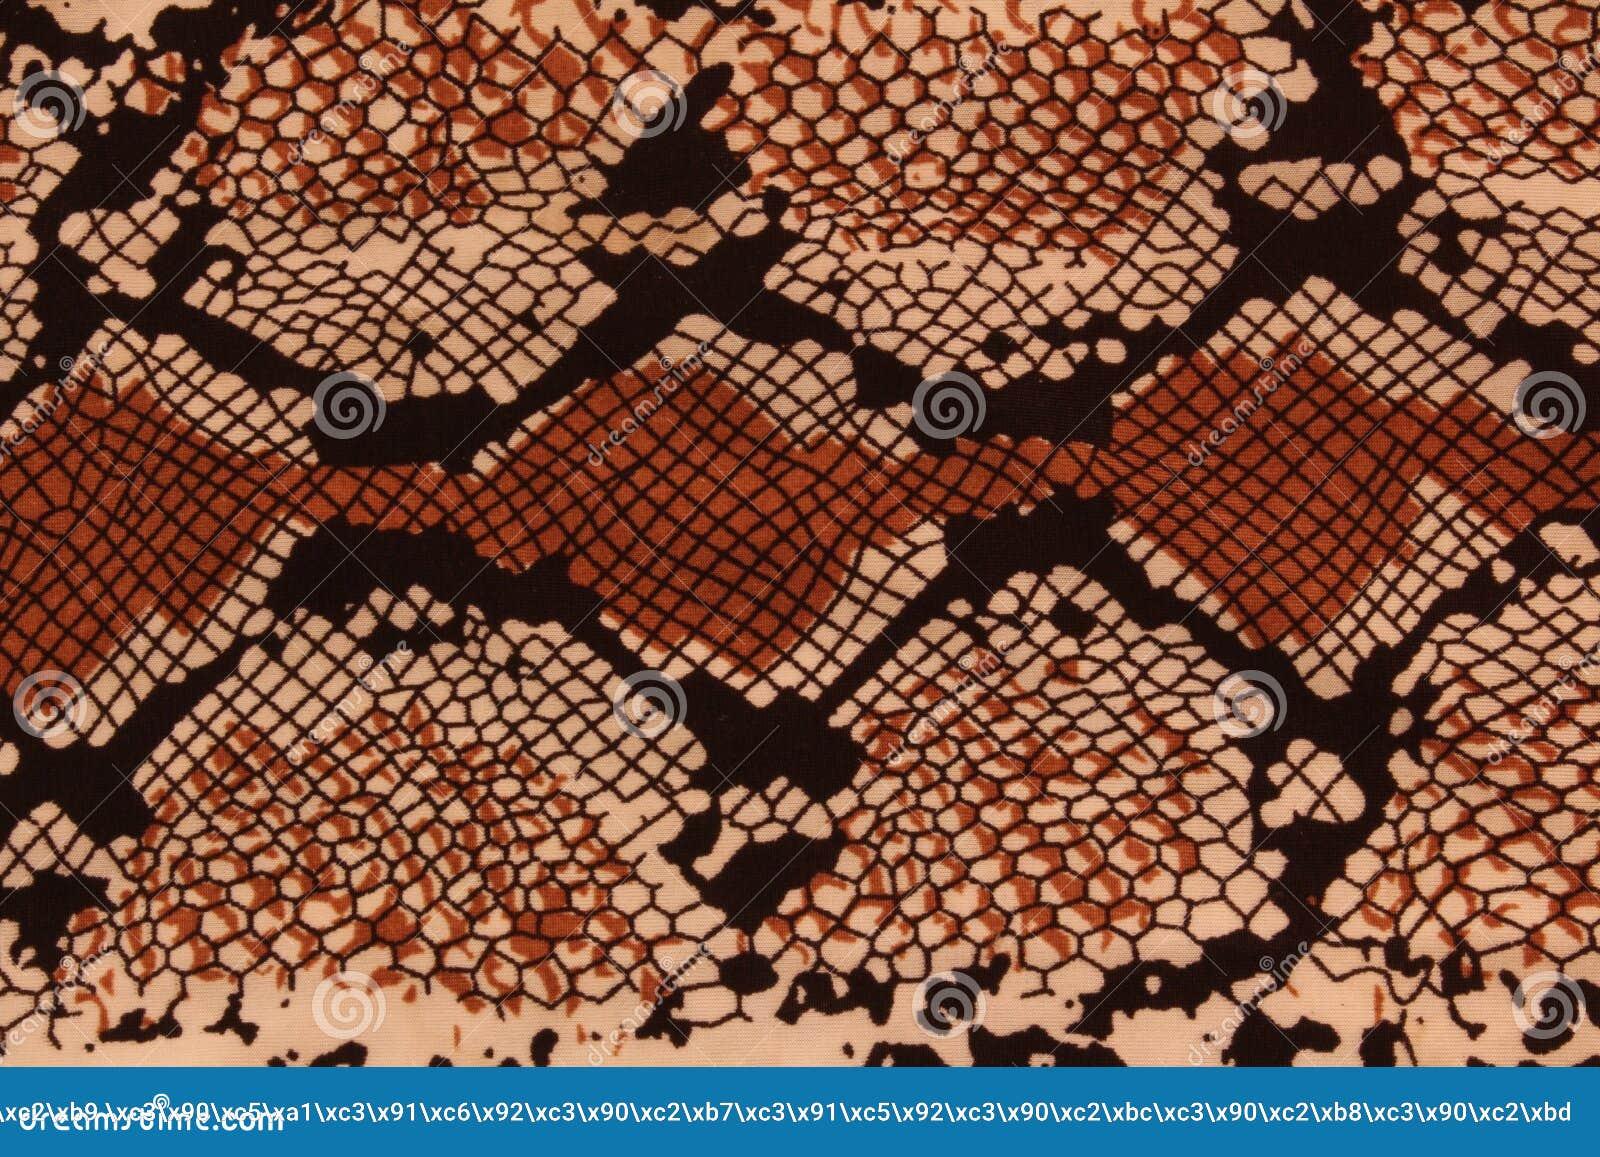 Dessin de peau de serpent de fond illustration stock - Dessin de serpent ...